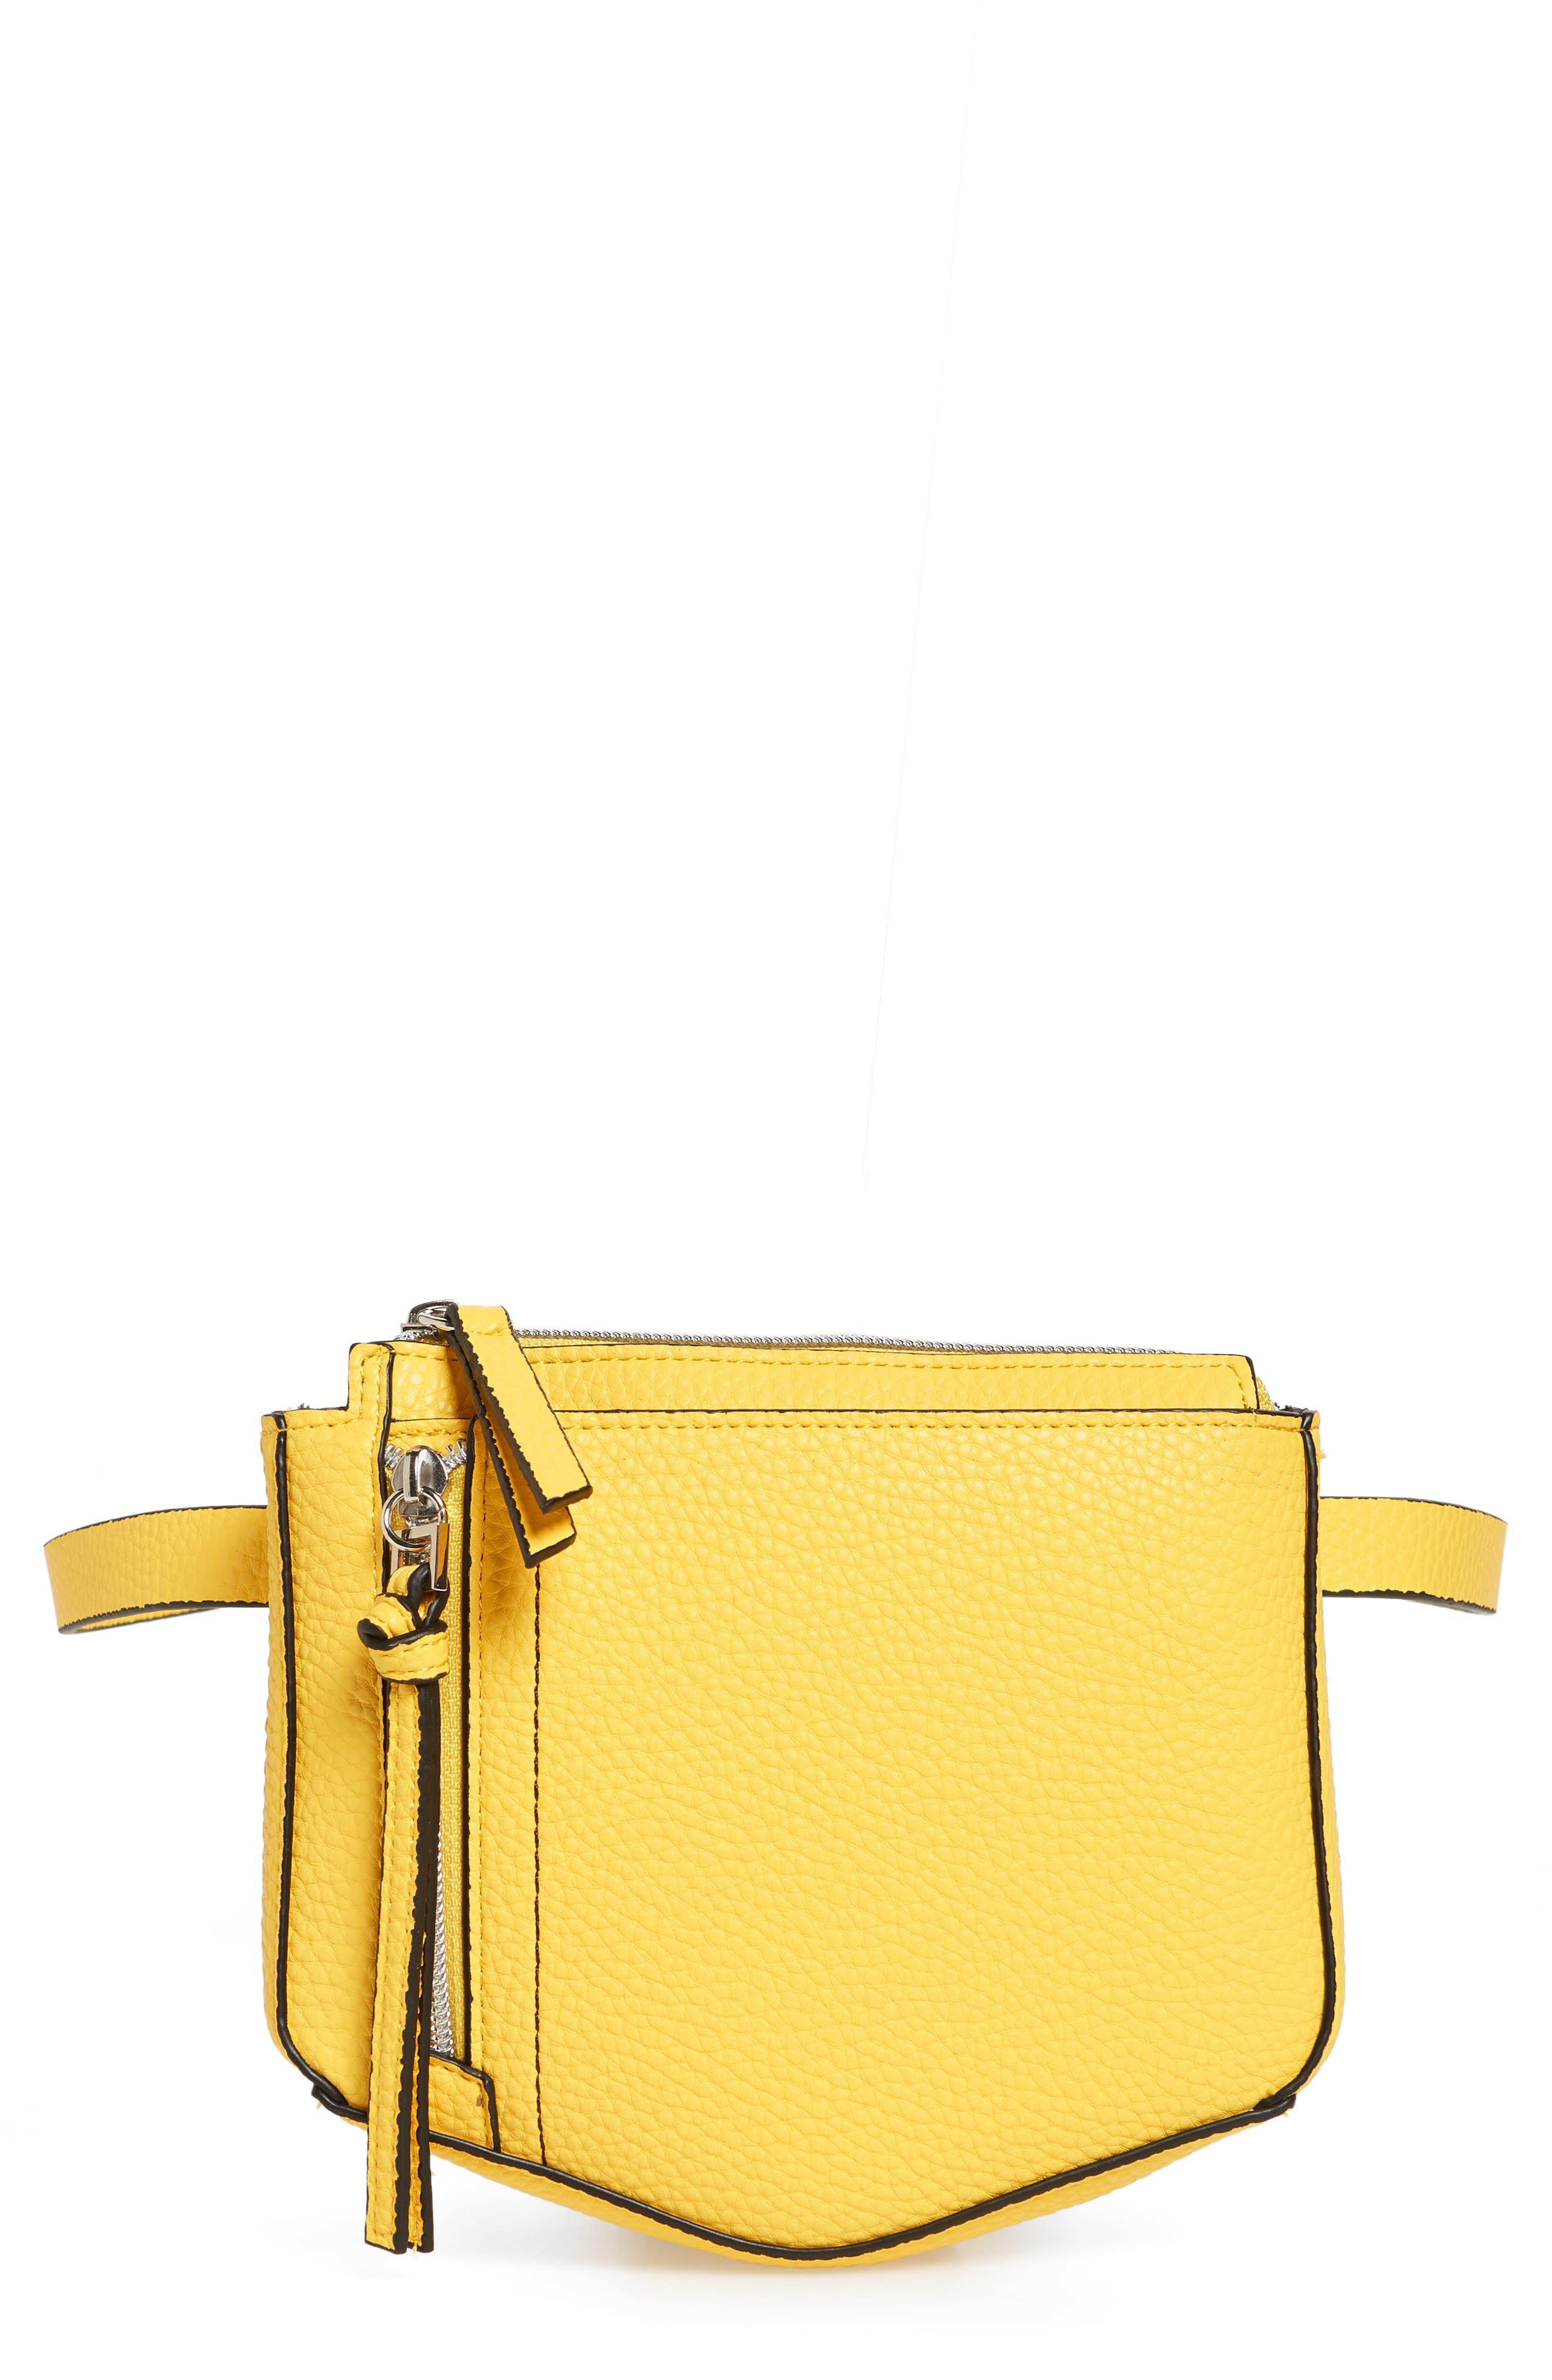 DANIELLE NICOLE Elia Faux Leather Belt Bag - Yellow in Mustard